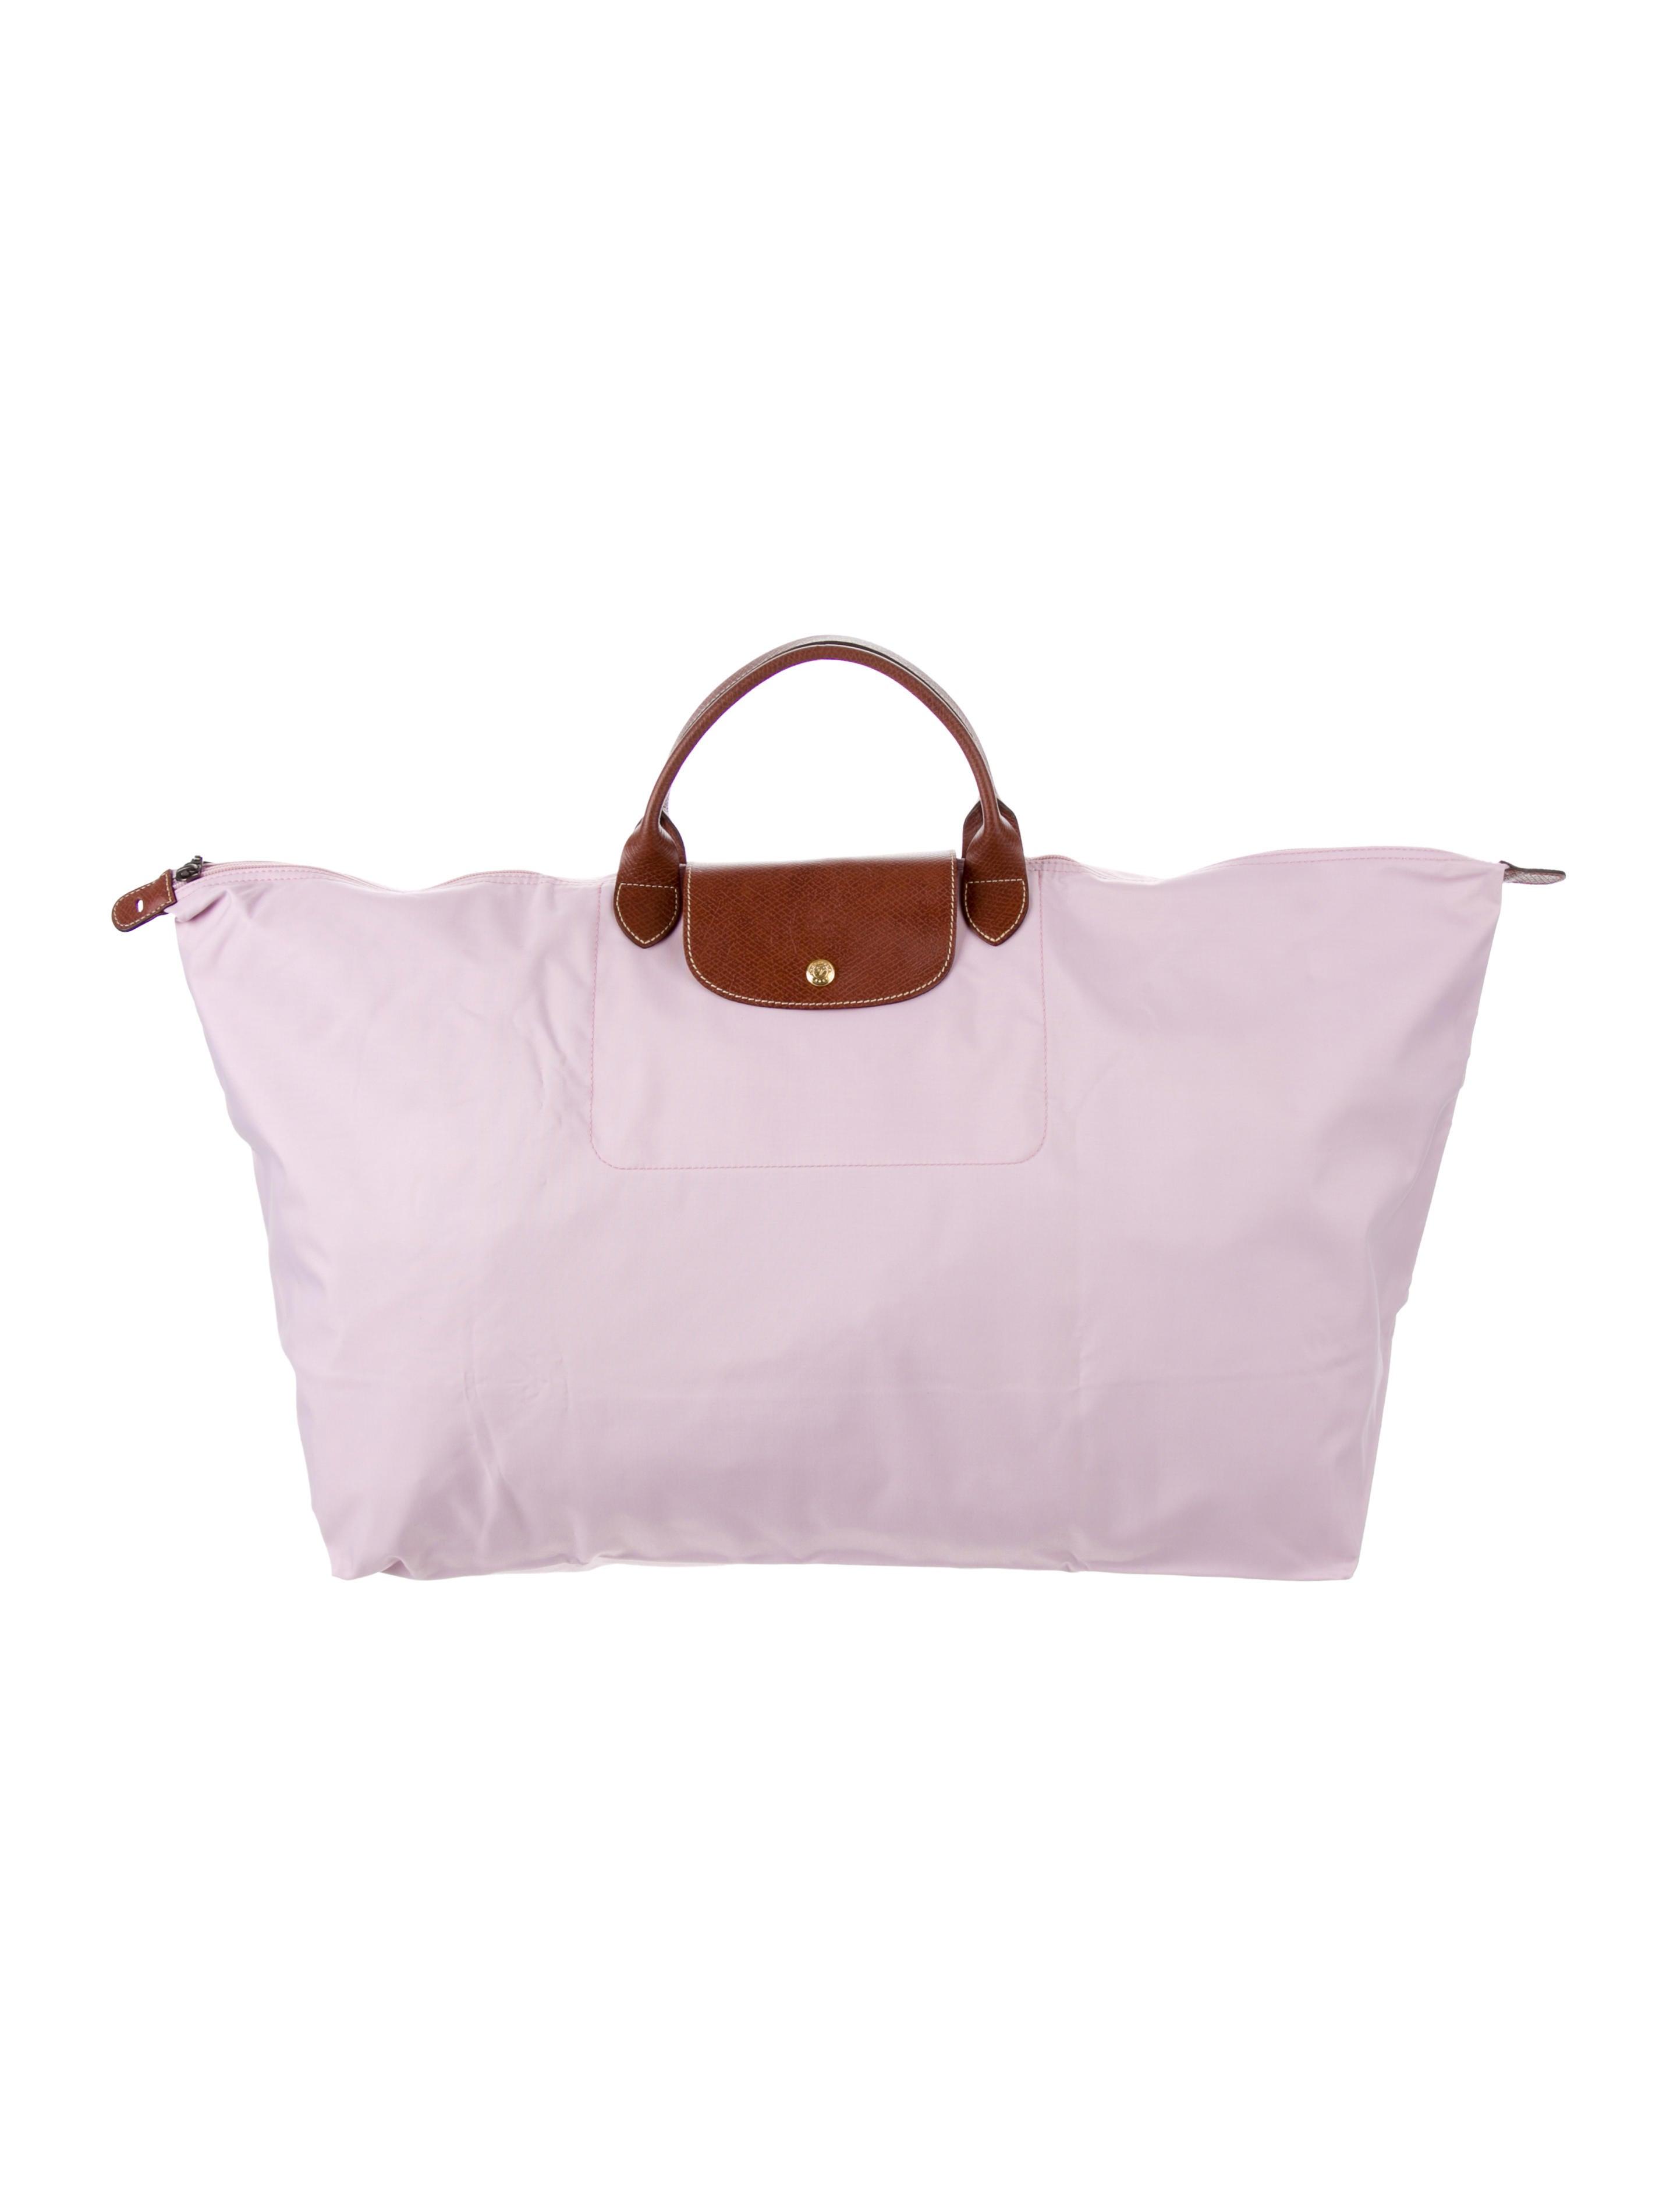 dca3644c9fc Longchamp Le Pliage Travel Bag   ReGreen Springfield